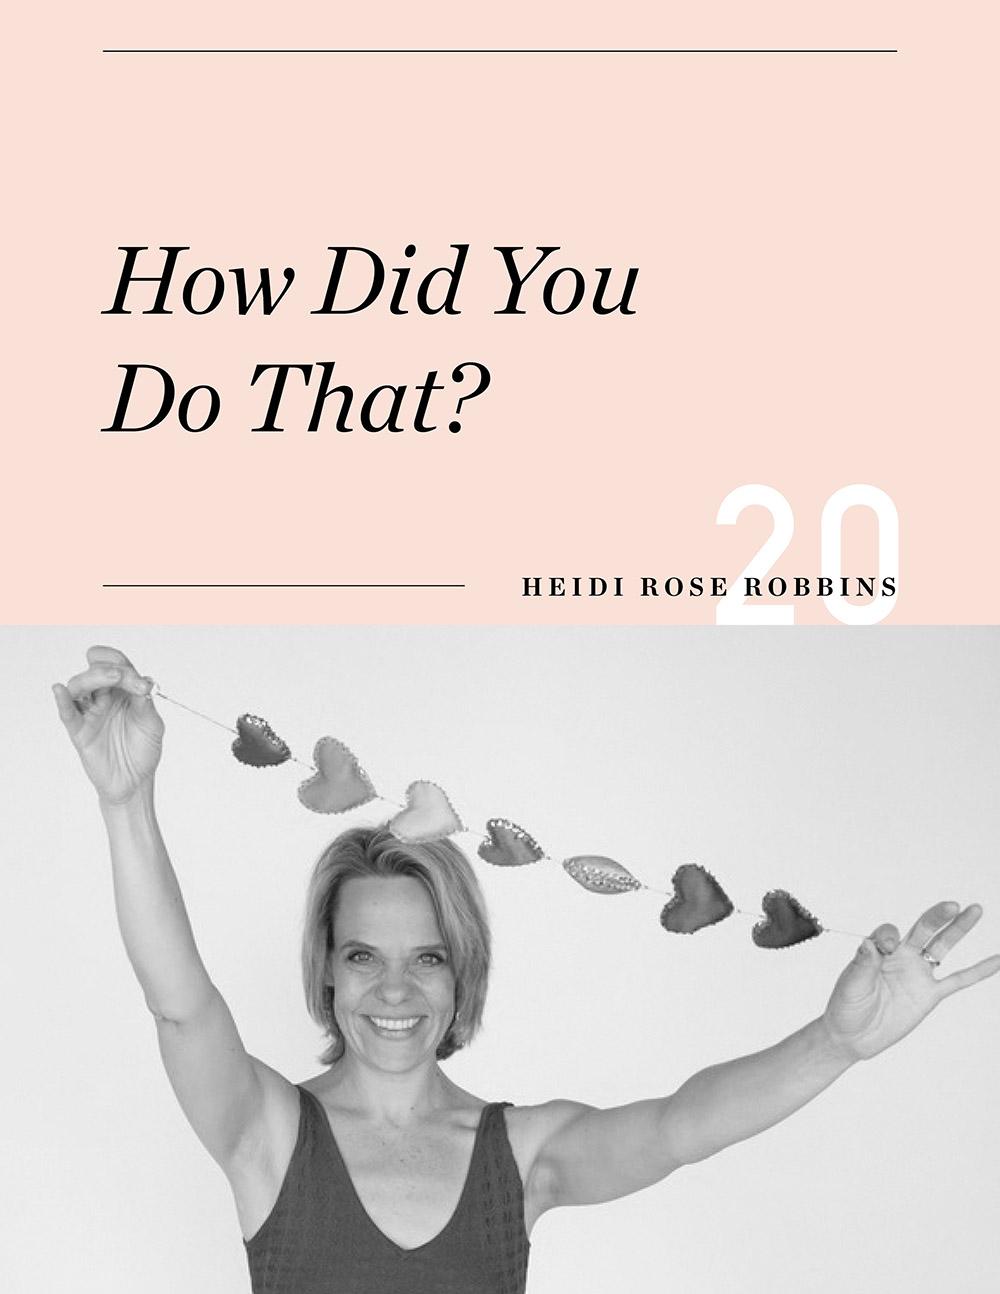 Ellen Fondiler | An Interview with Heidi Rose Robbins